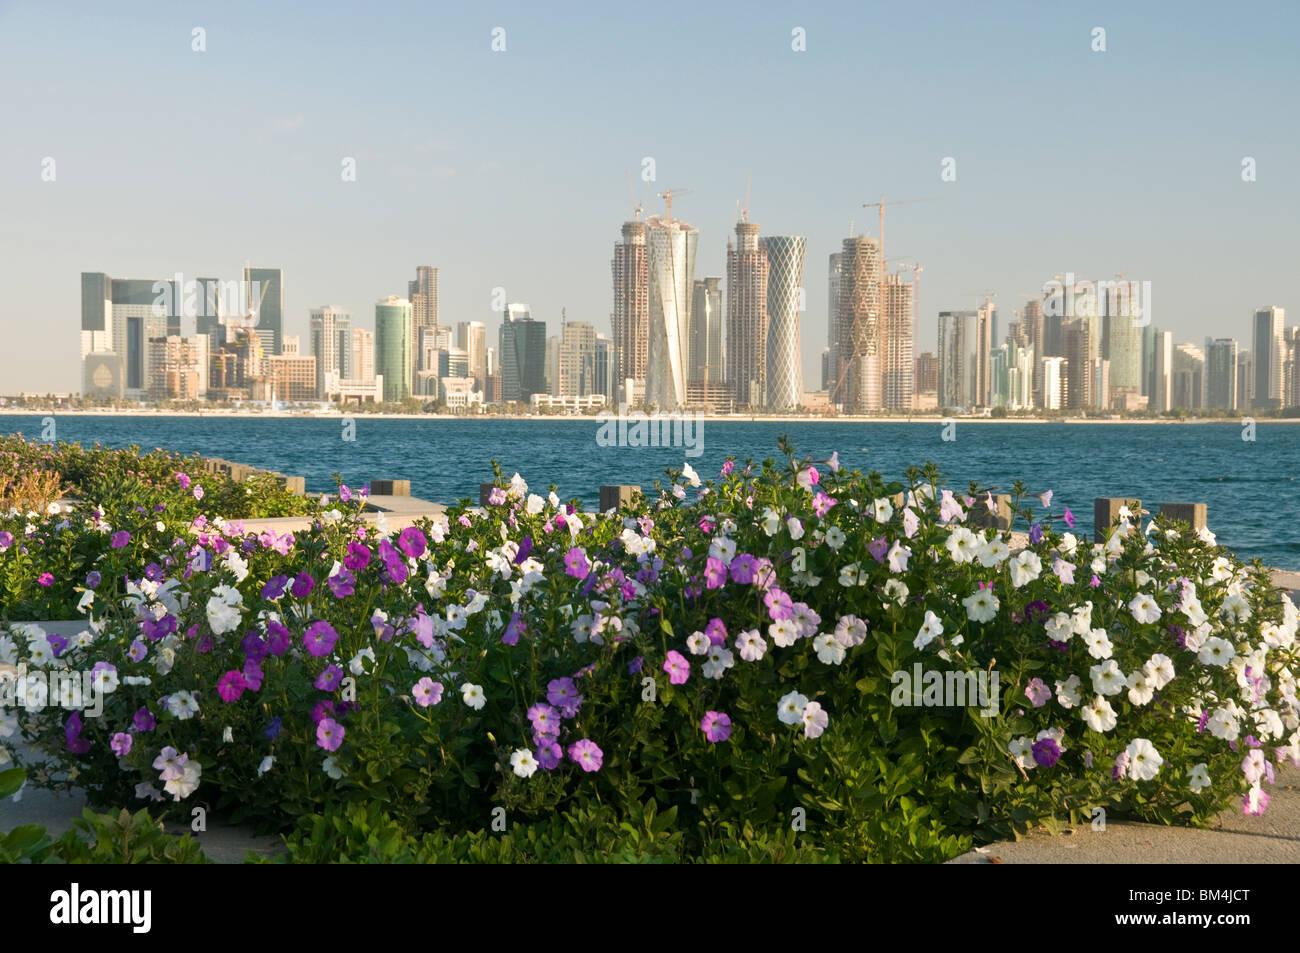 Qatar, Doha, city towers across Doha Bay - Stock Image